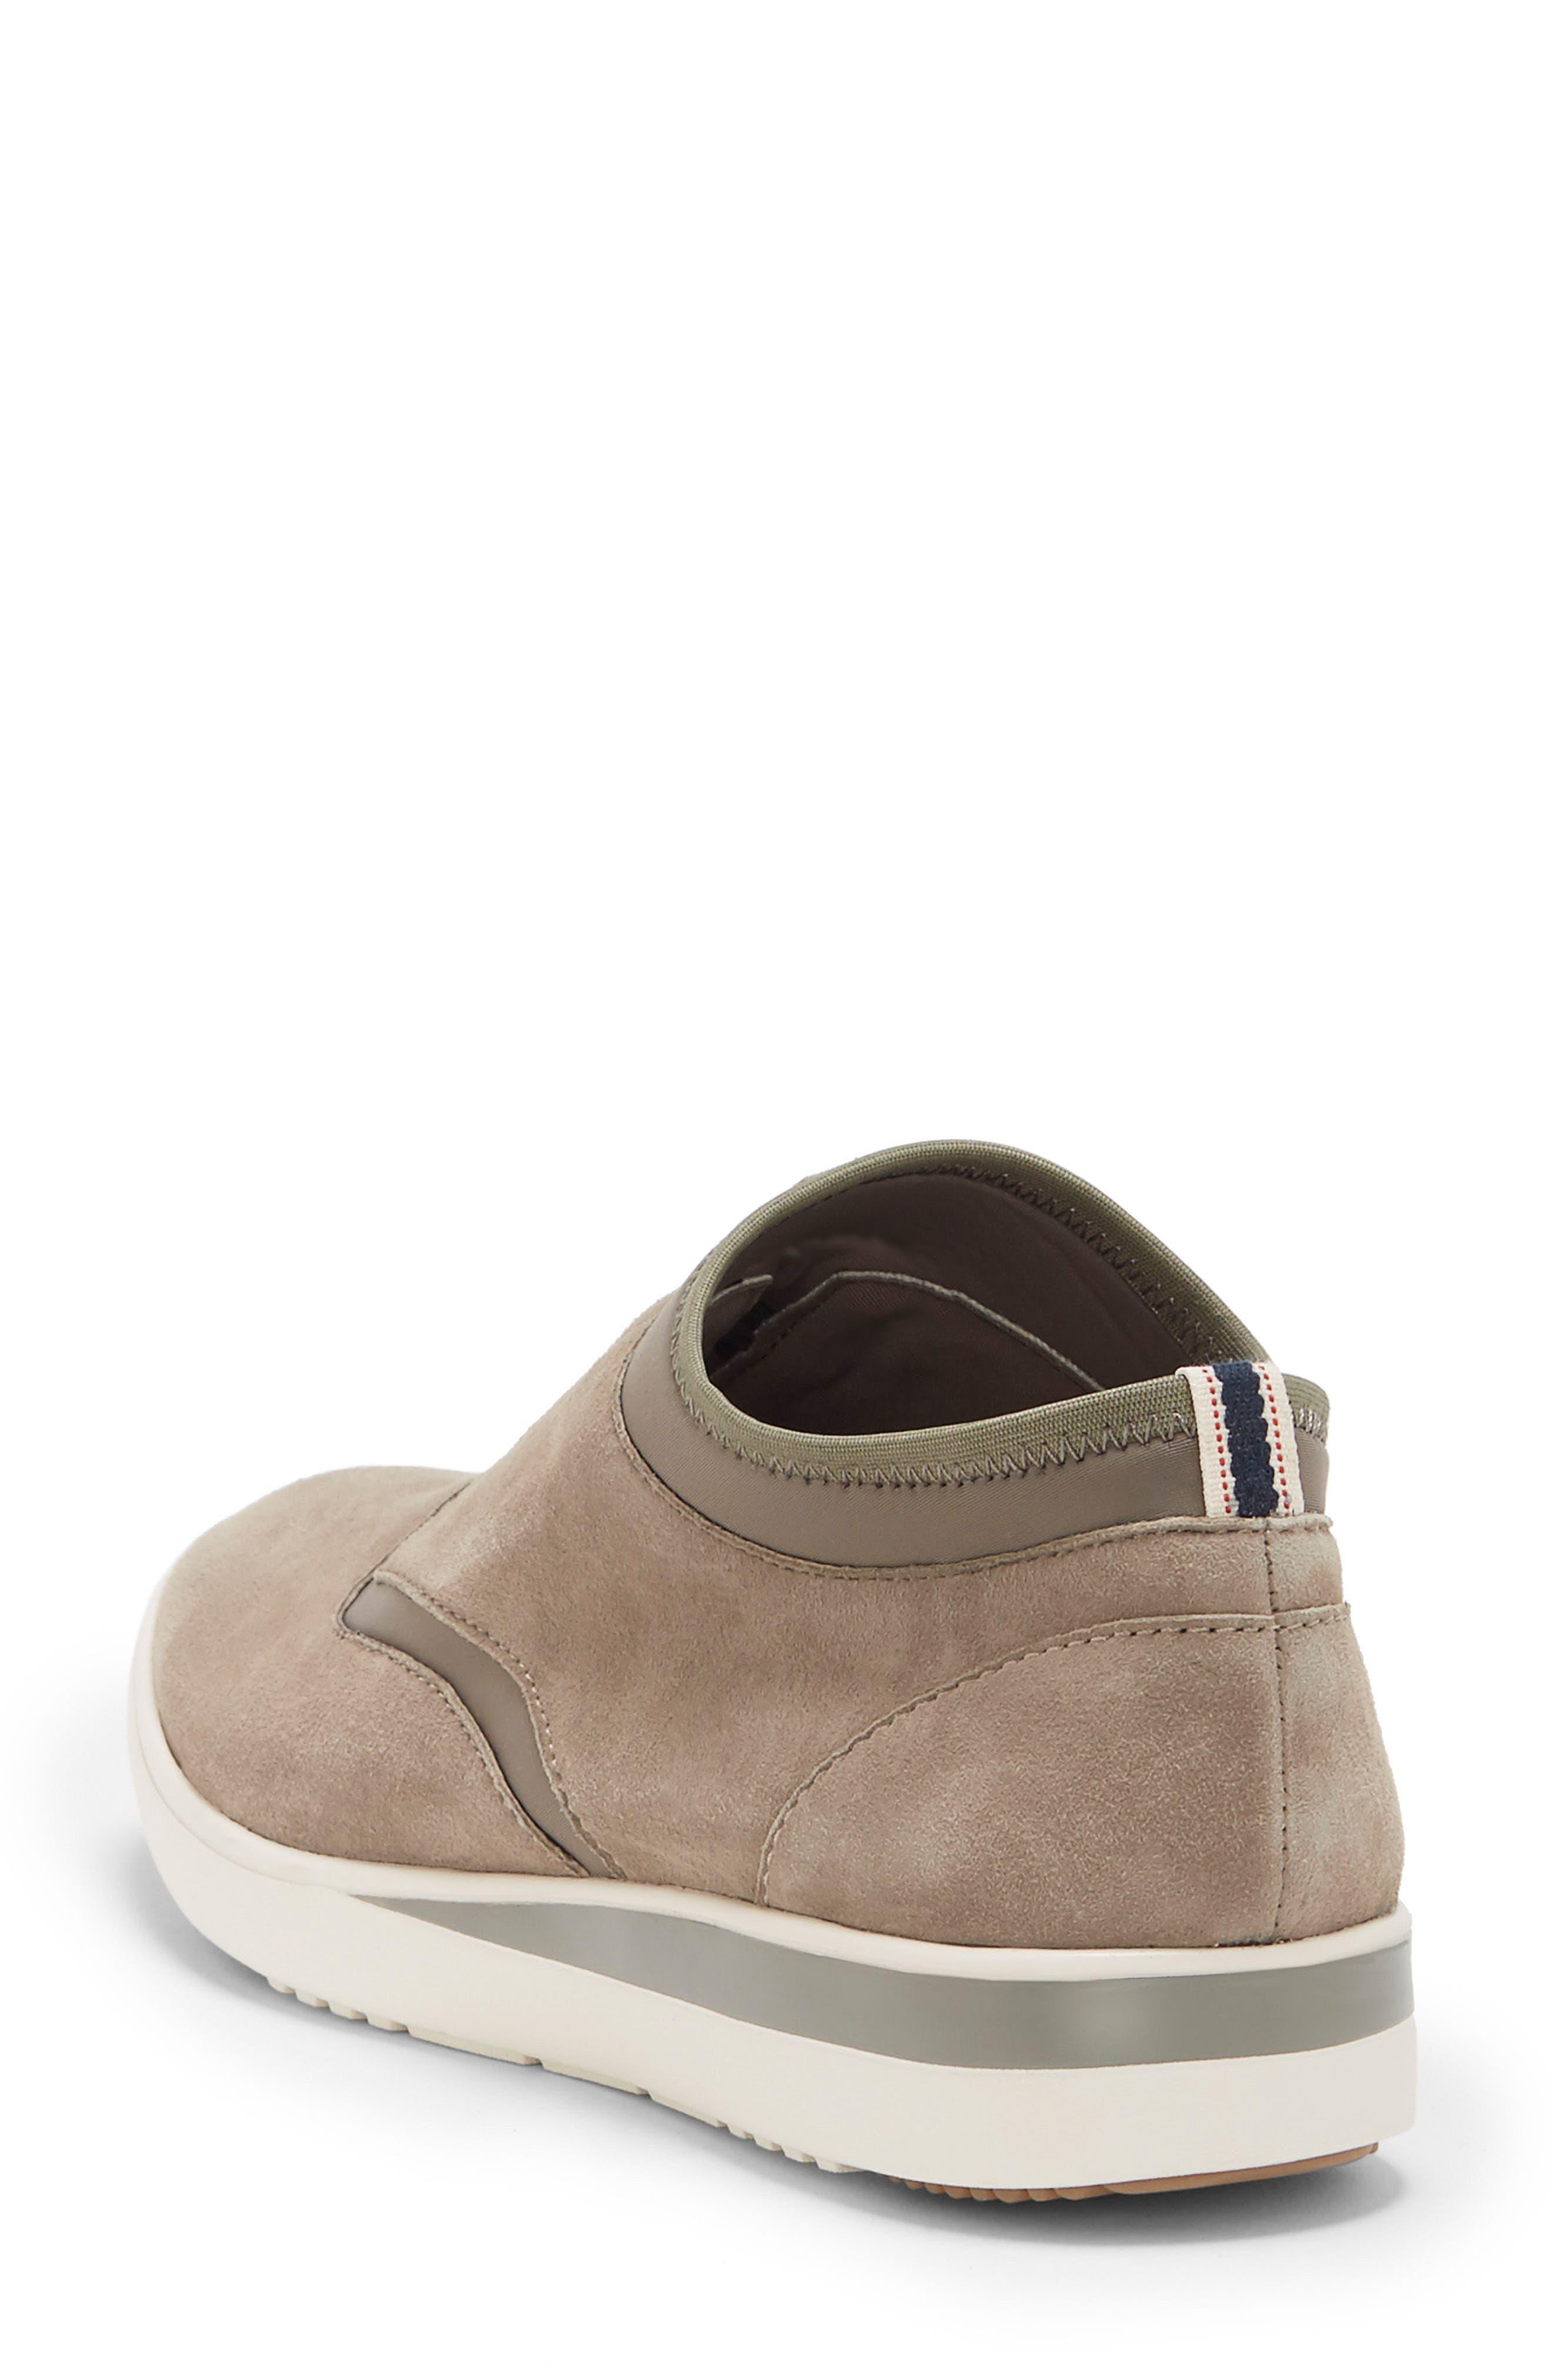 Atala Sneaker,                             Alternate thumbnail 2, color,                             Stone Suede